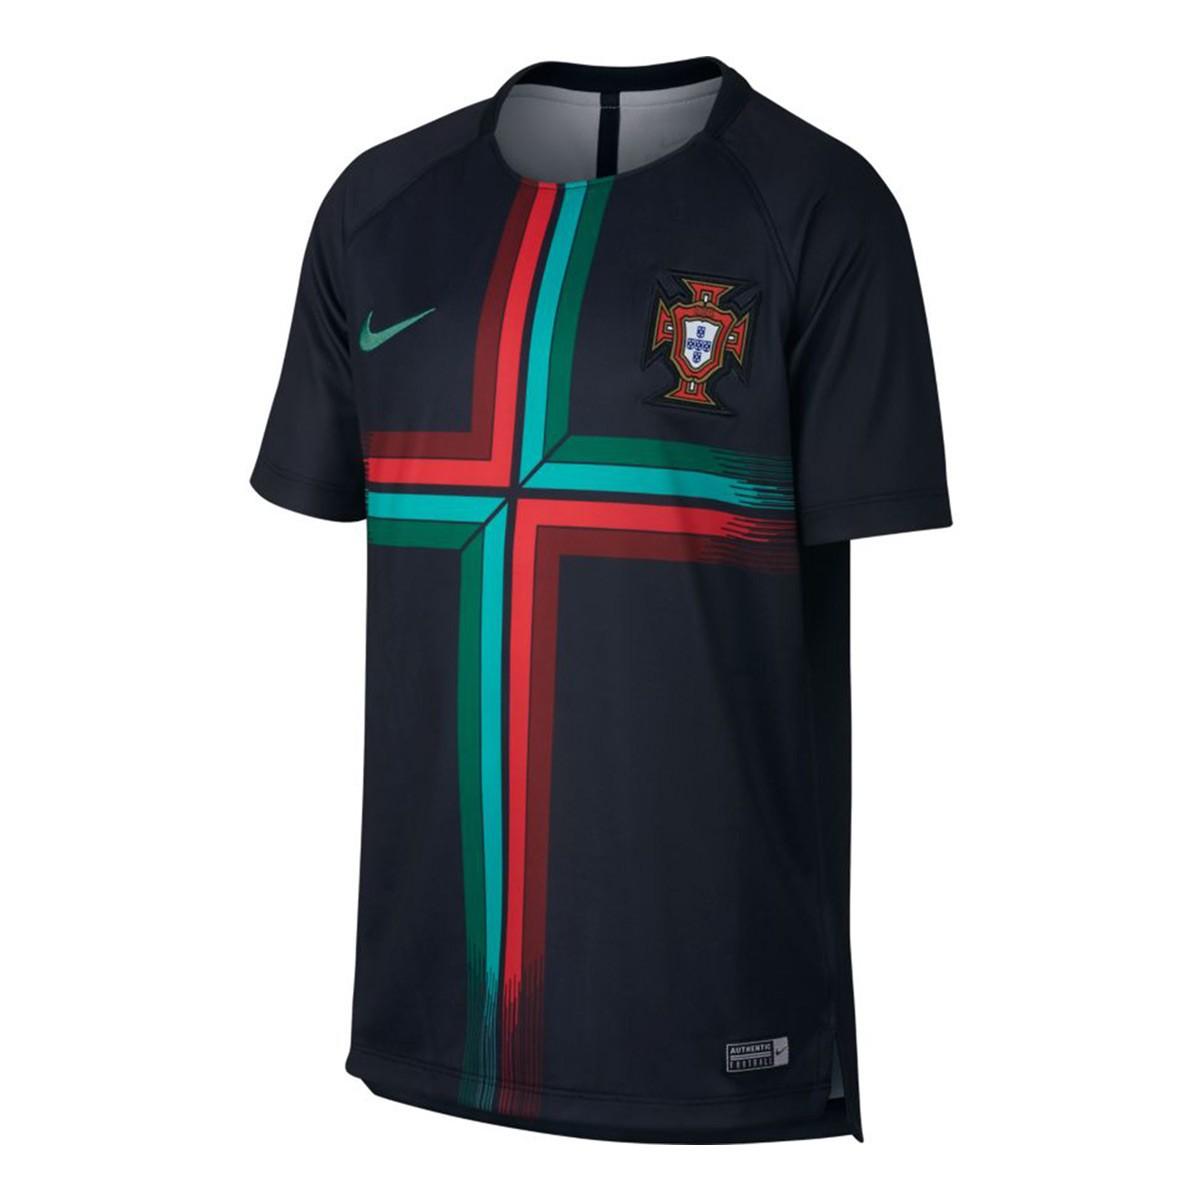 e3dcf3663c78d Camiseta Nike Portugal Dry Squad GX 2018-2019 Niño Black-Kinetic green -  Tienda de fútbol Fútbol Emotion